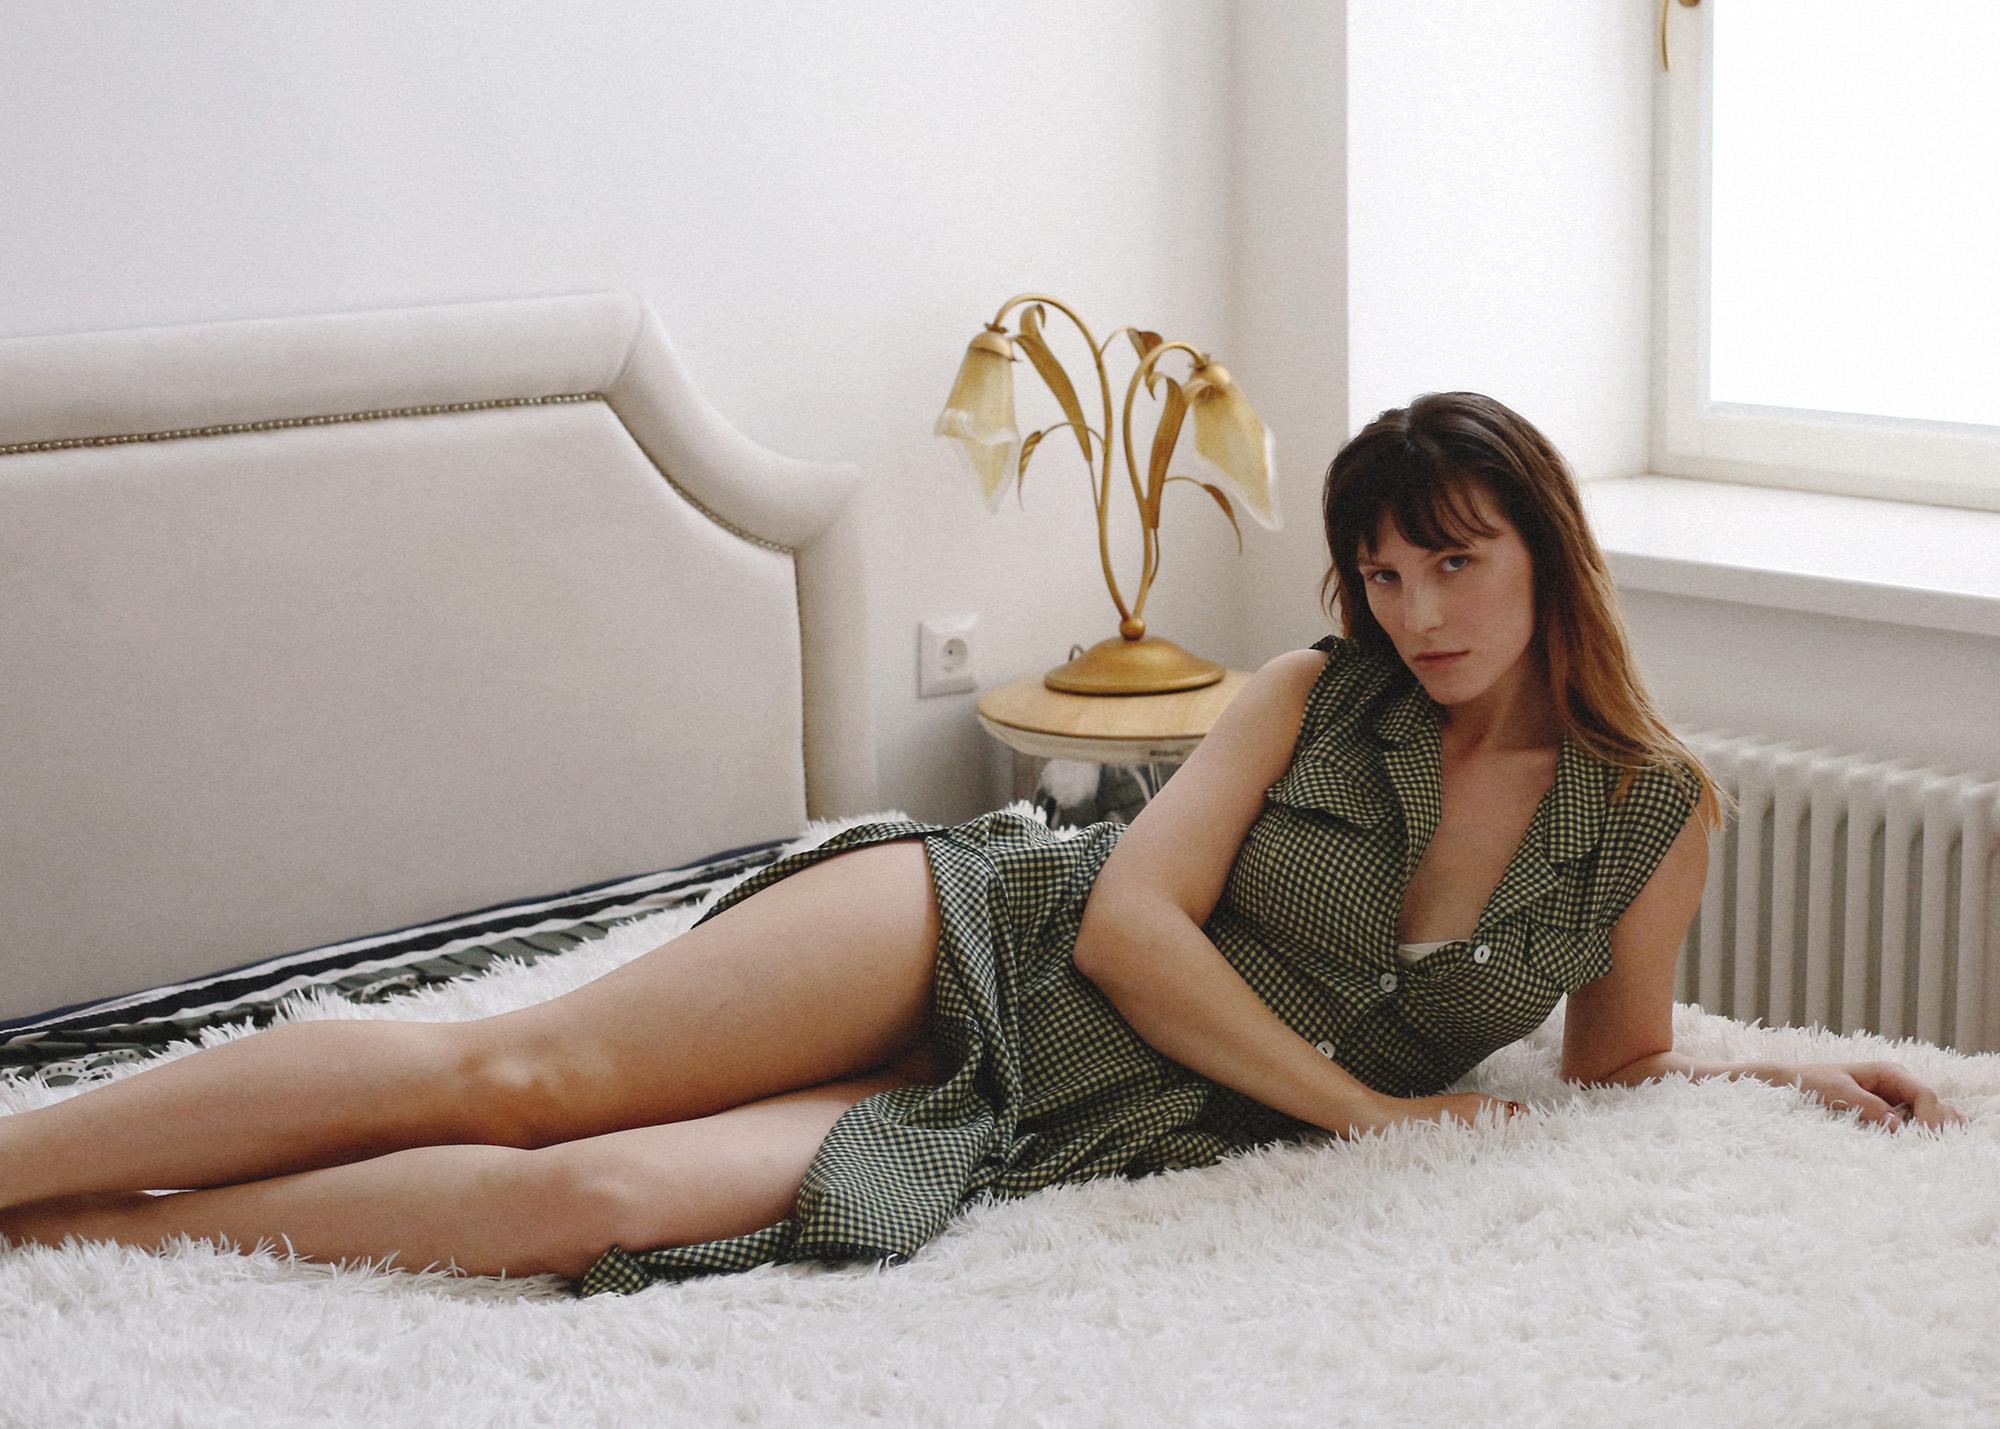 Anastacia_Belyaeva_Marina_Ulyanova_by_WUL_Magazine_07.jpg